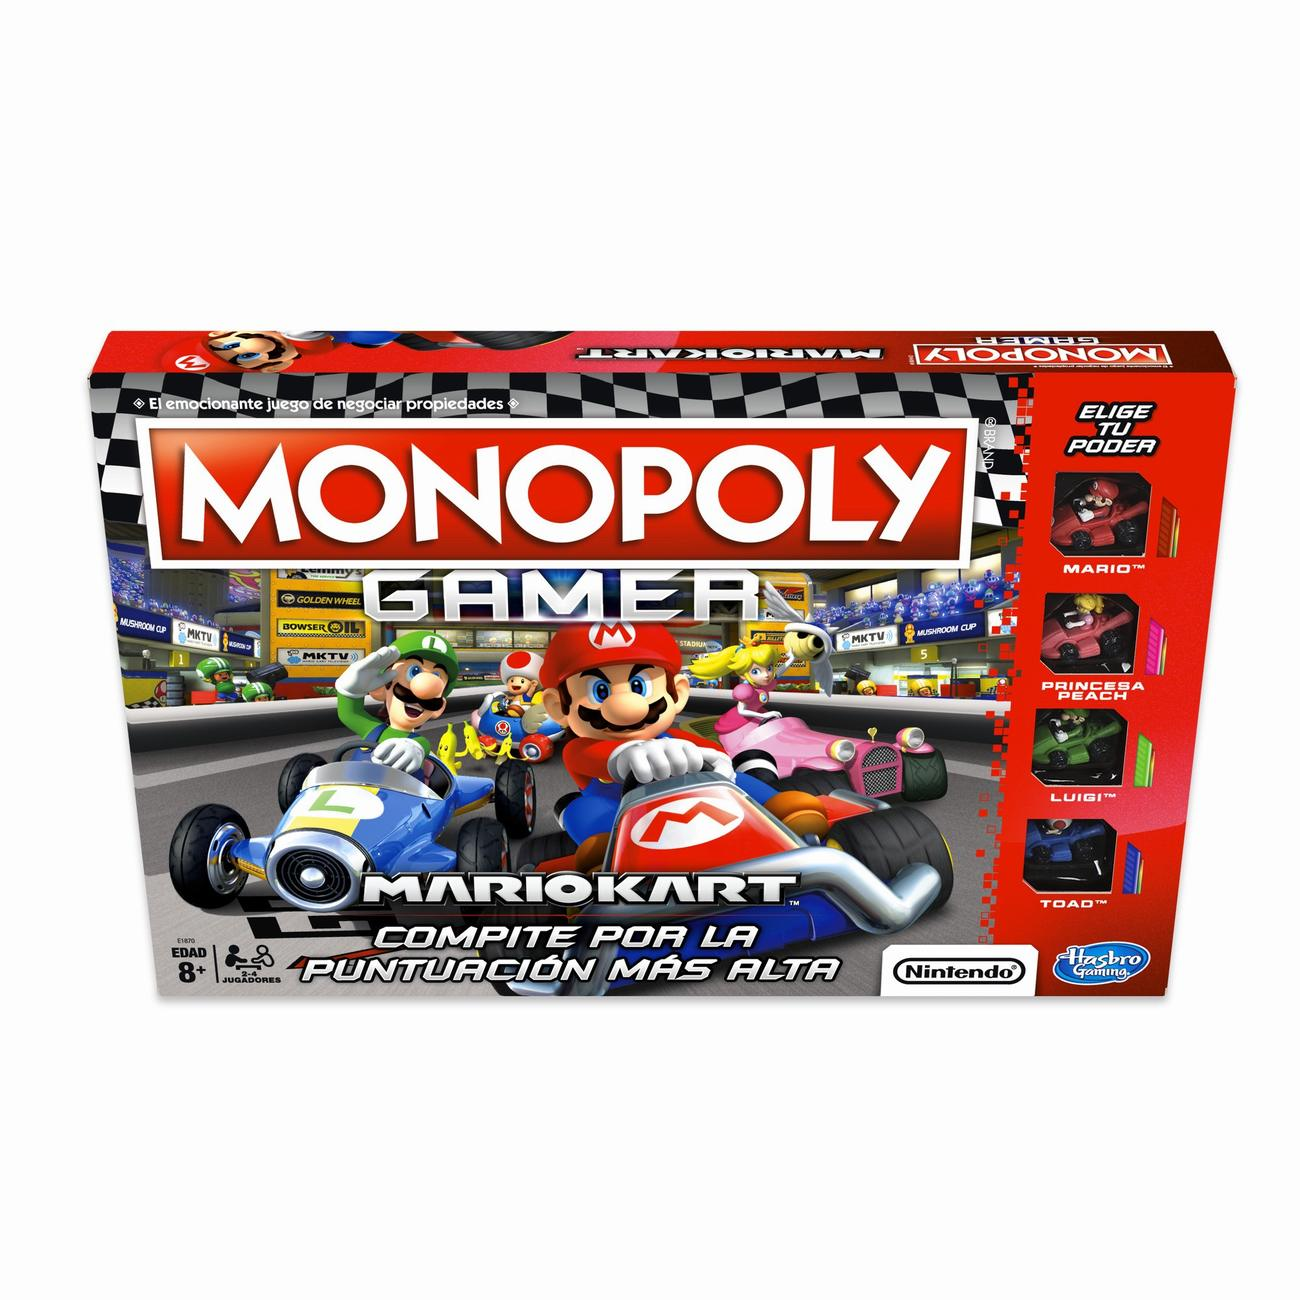 Monopoly Gamer Mariokart